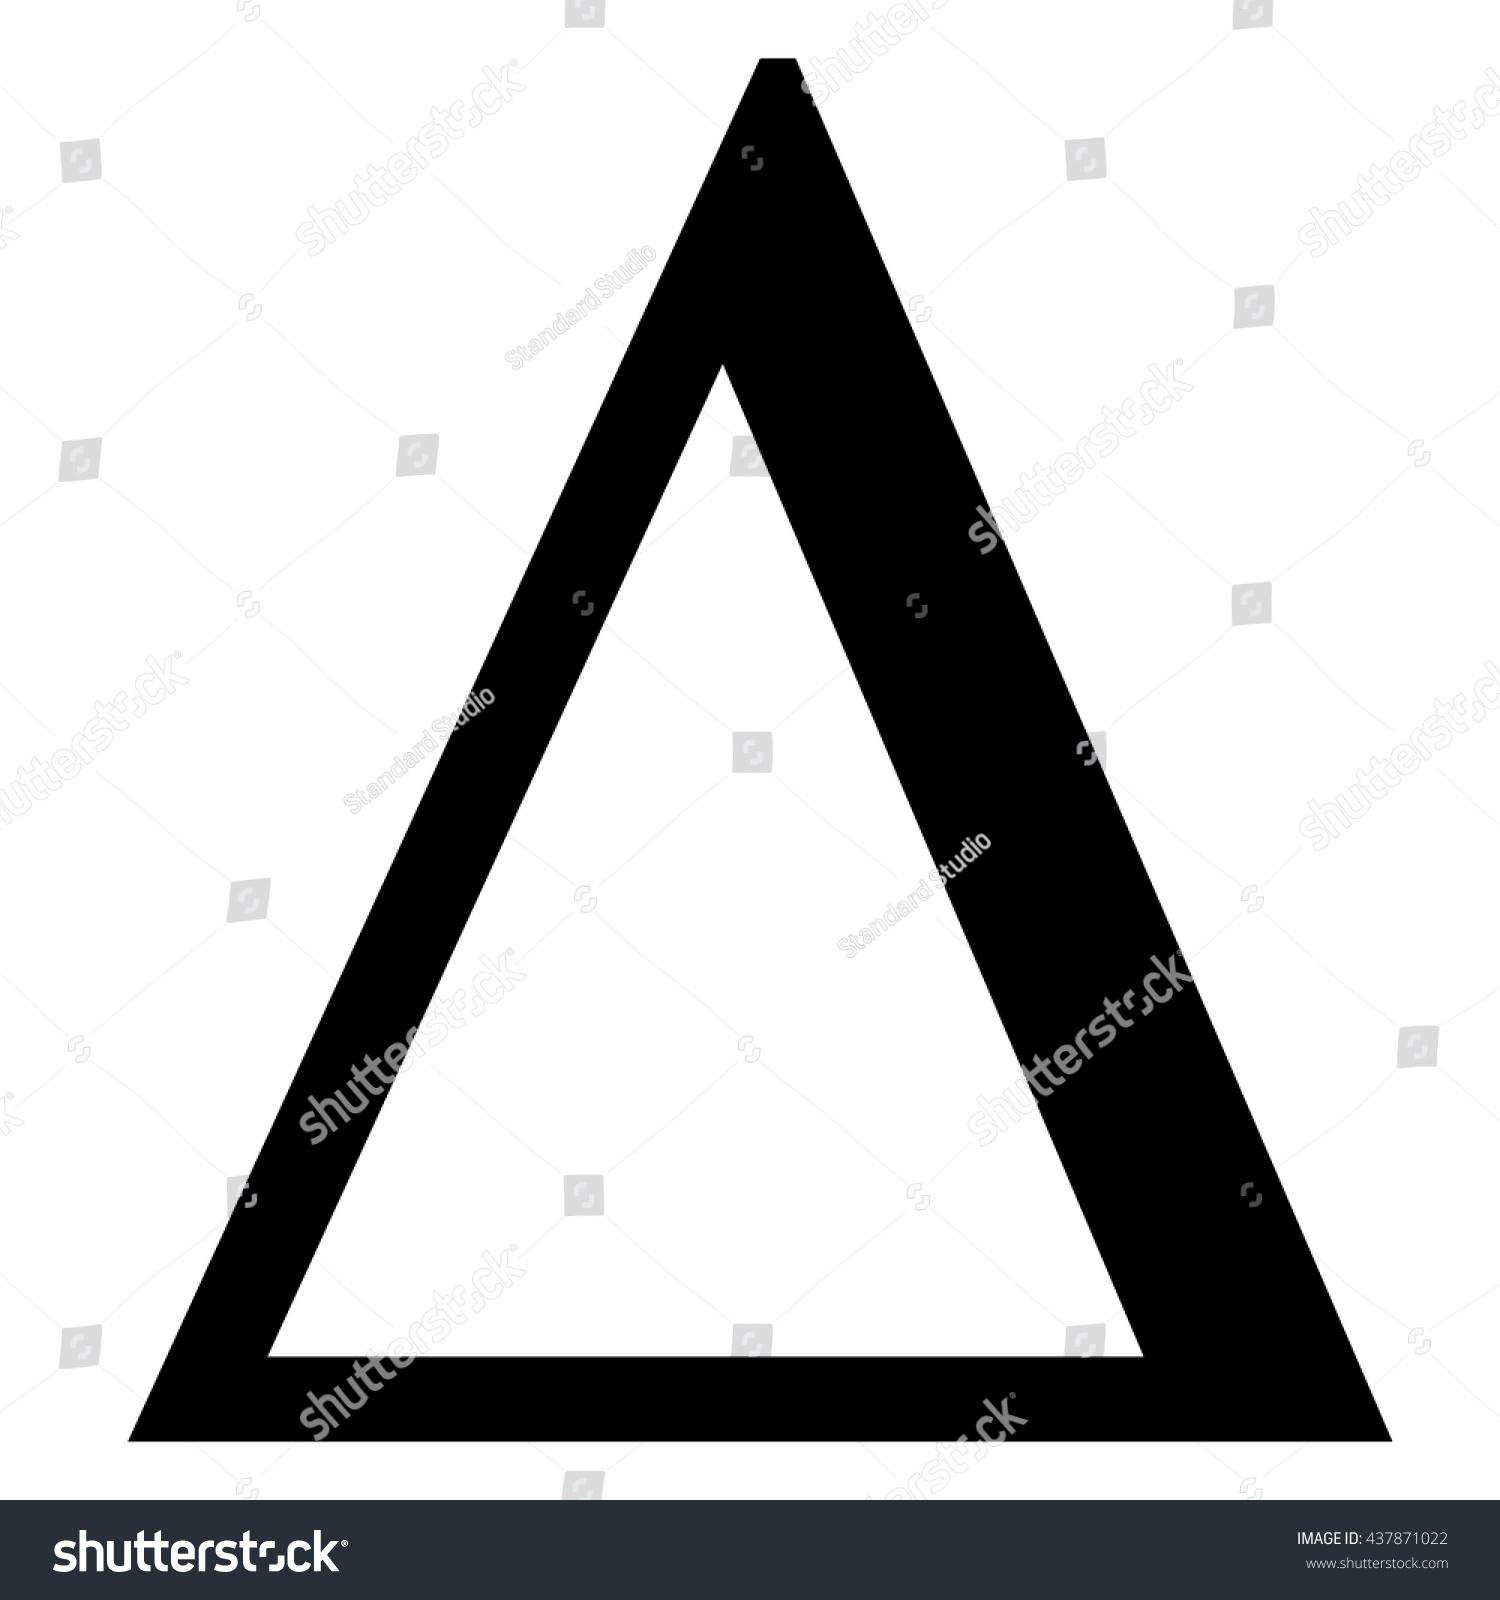 Delta greek letter icon delta symbol stock vector 437871022 delta greek letter icon delta symbol vector illustration biocorpaavc Choice Image